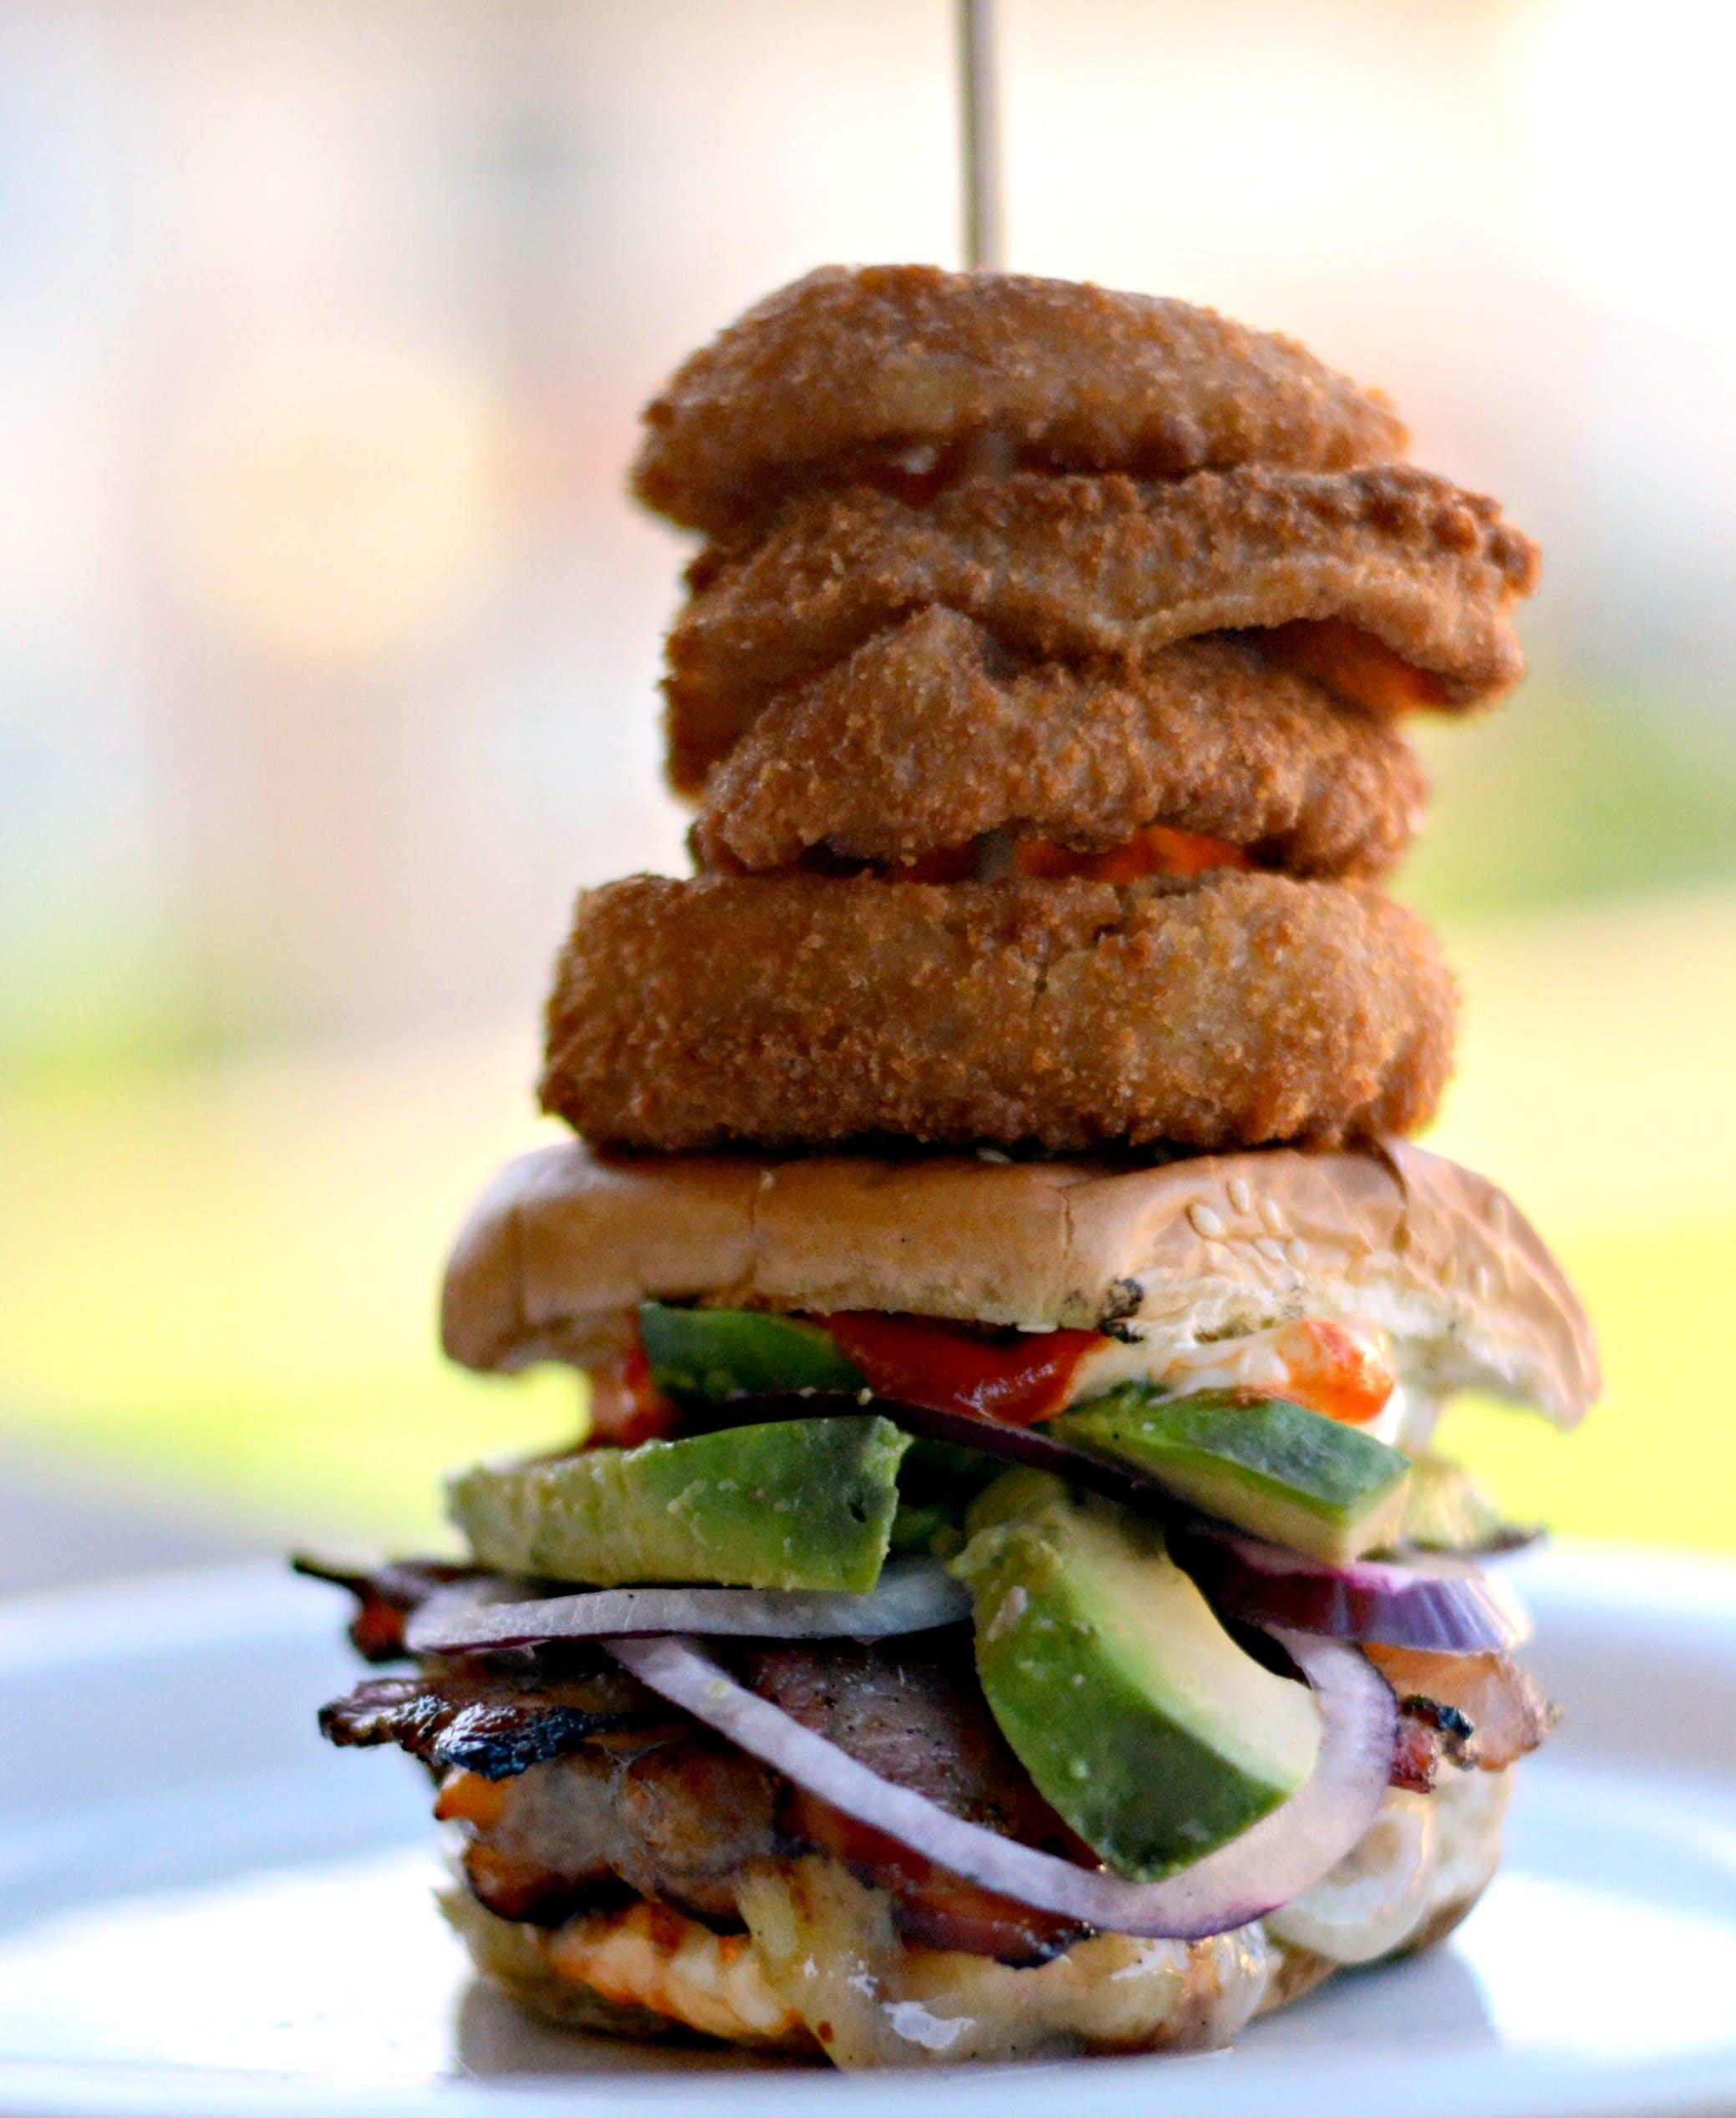 Free stock photo of food, avocado, cooking, burger